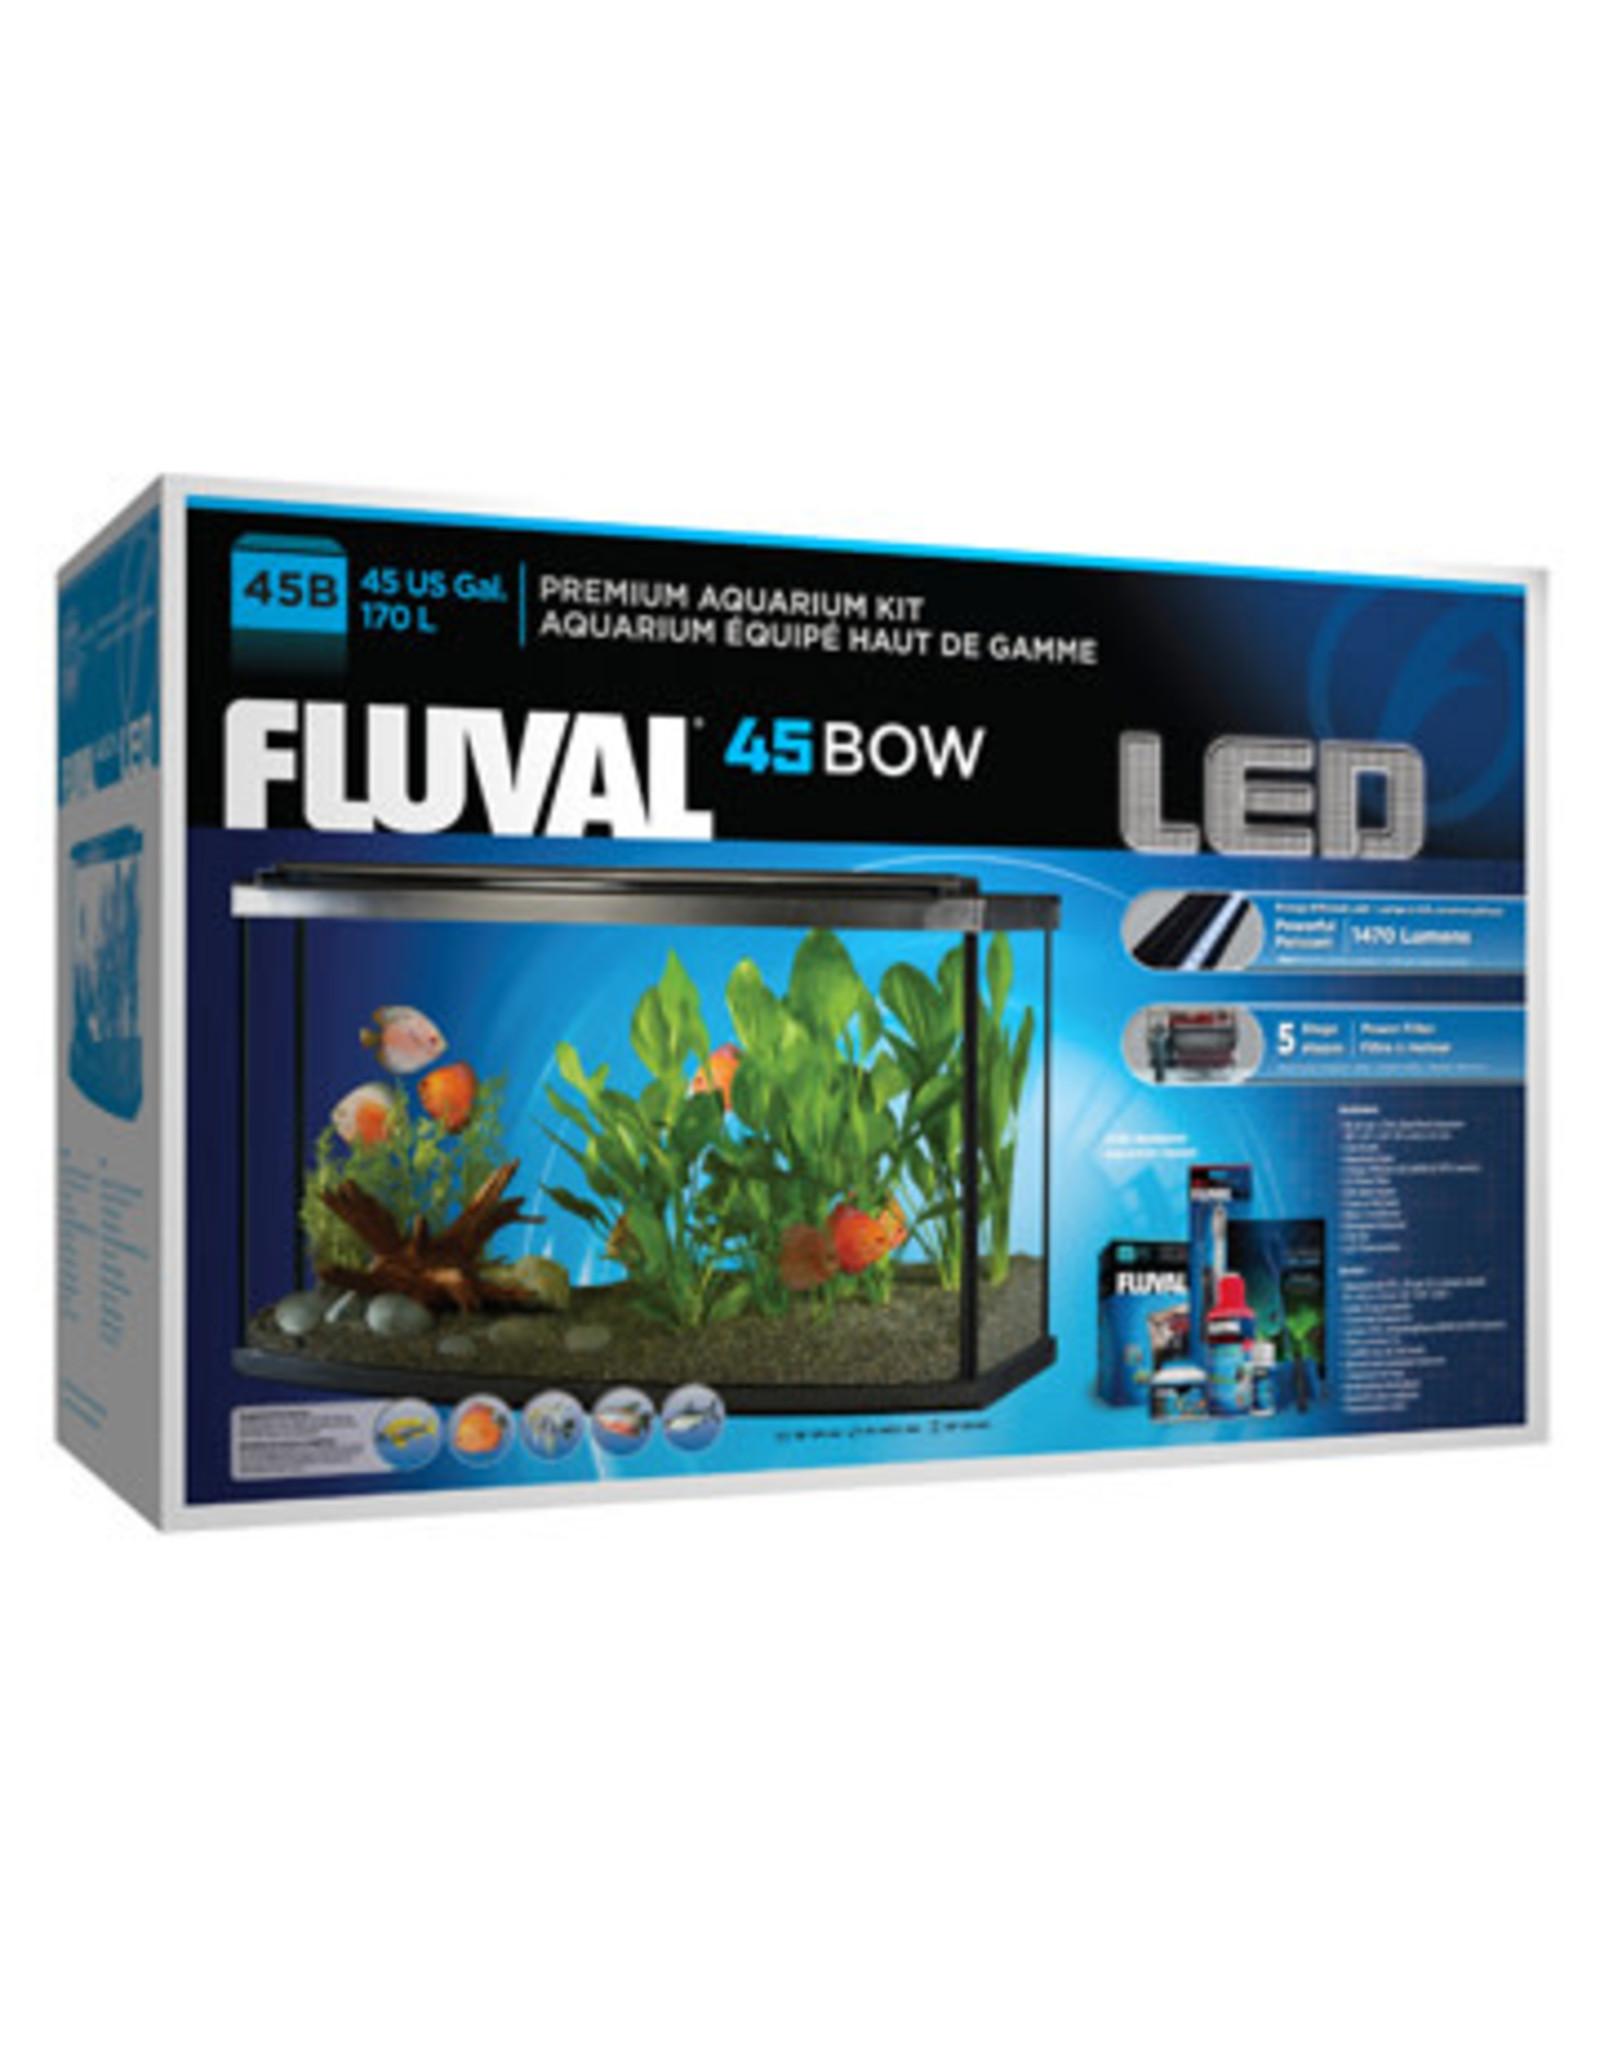 Fluval Fluval Premium Aquarium Kit with LED - 45 Bow - 170 L (45 US Gal)